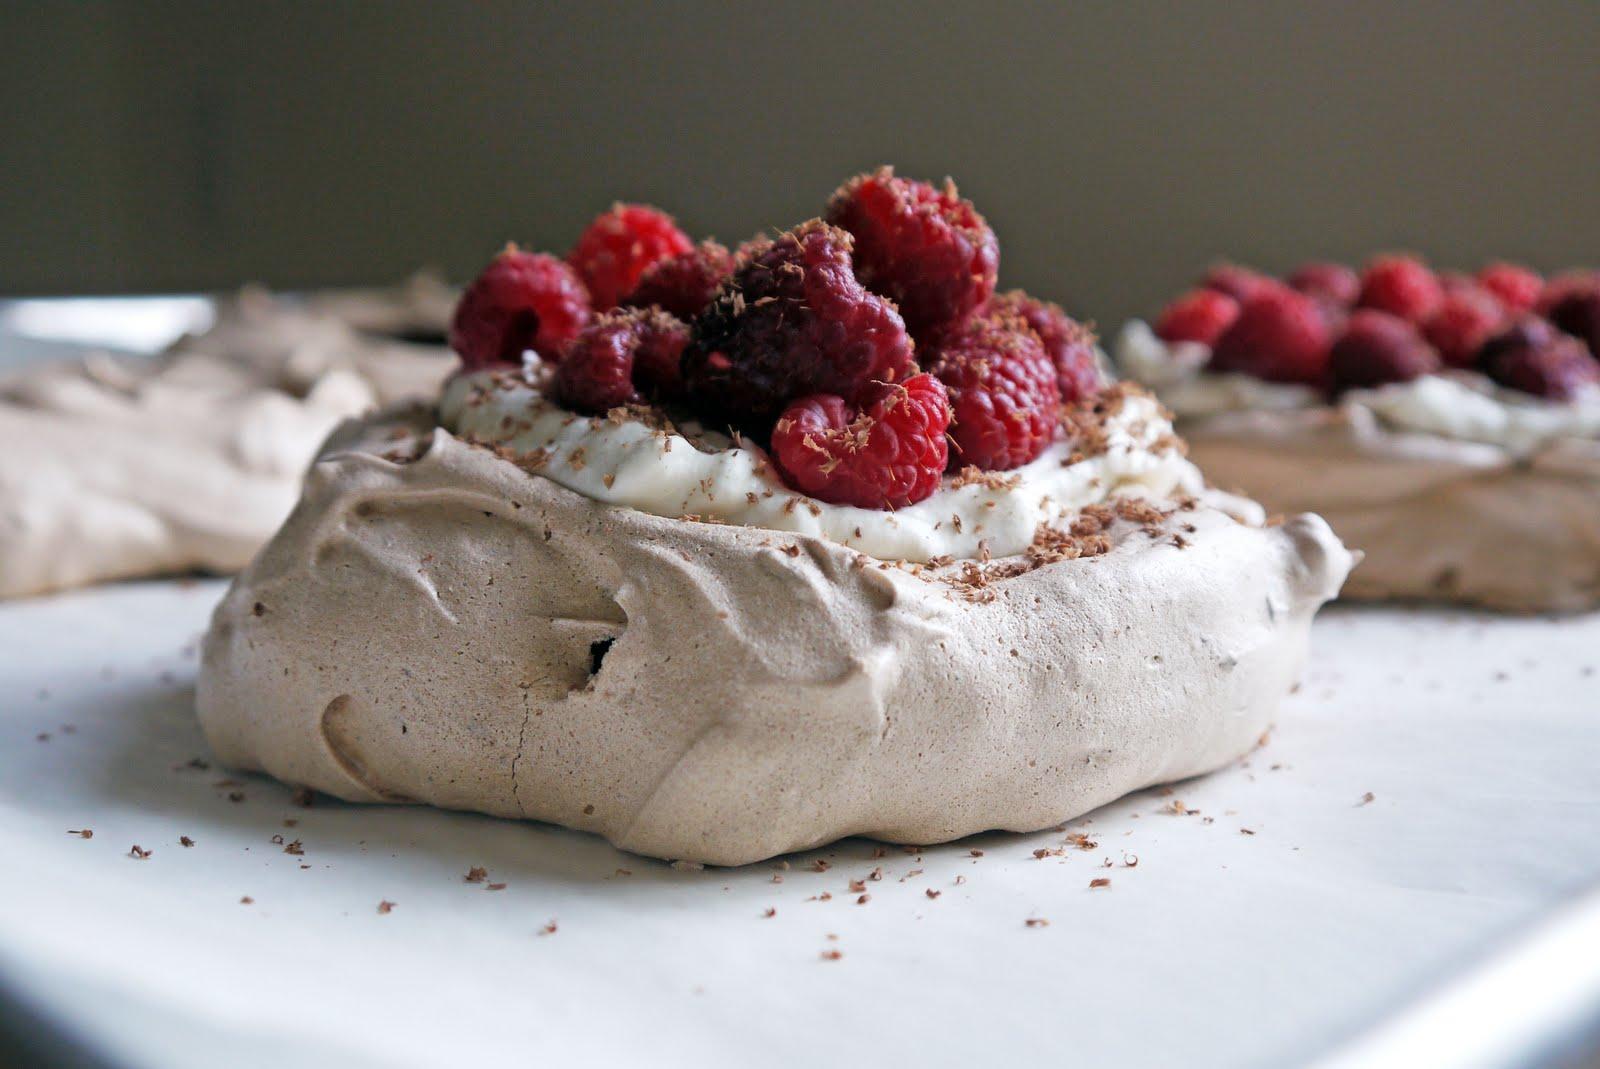 The Casual Baker: Chocolate raspberry pavlova